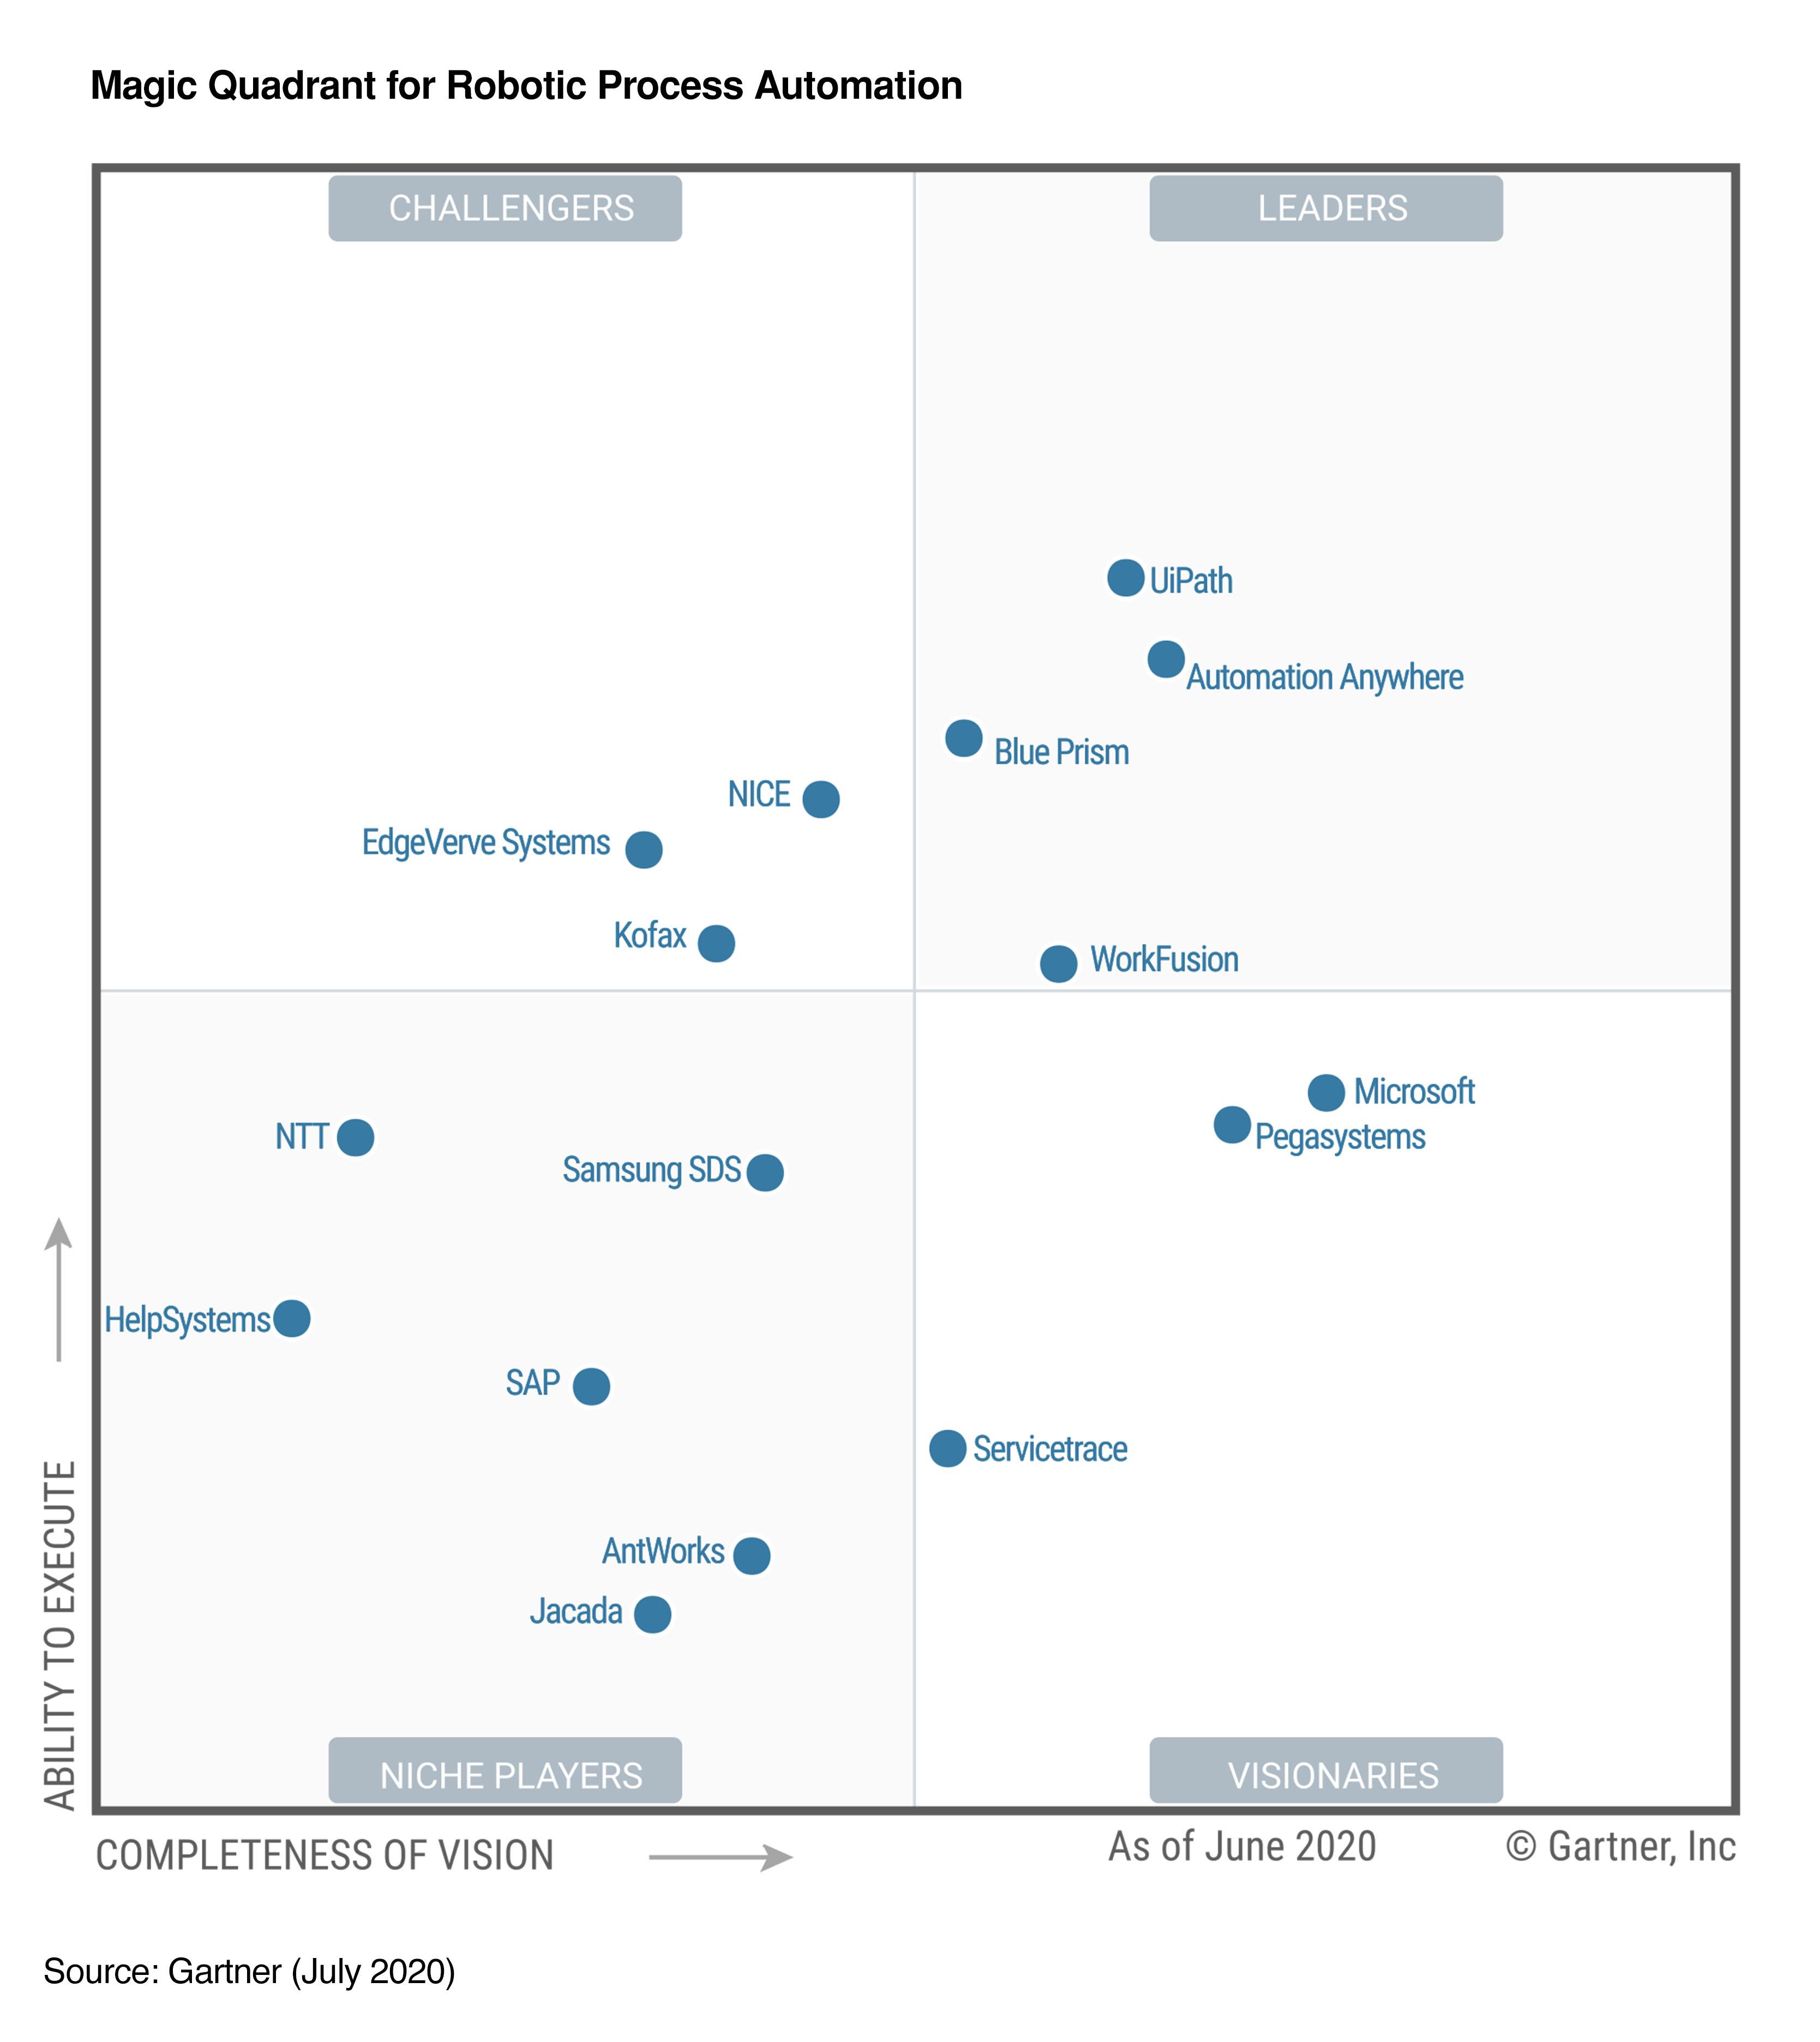 gartner-rpa-magic-quadrant-2020-leaders